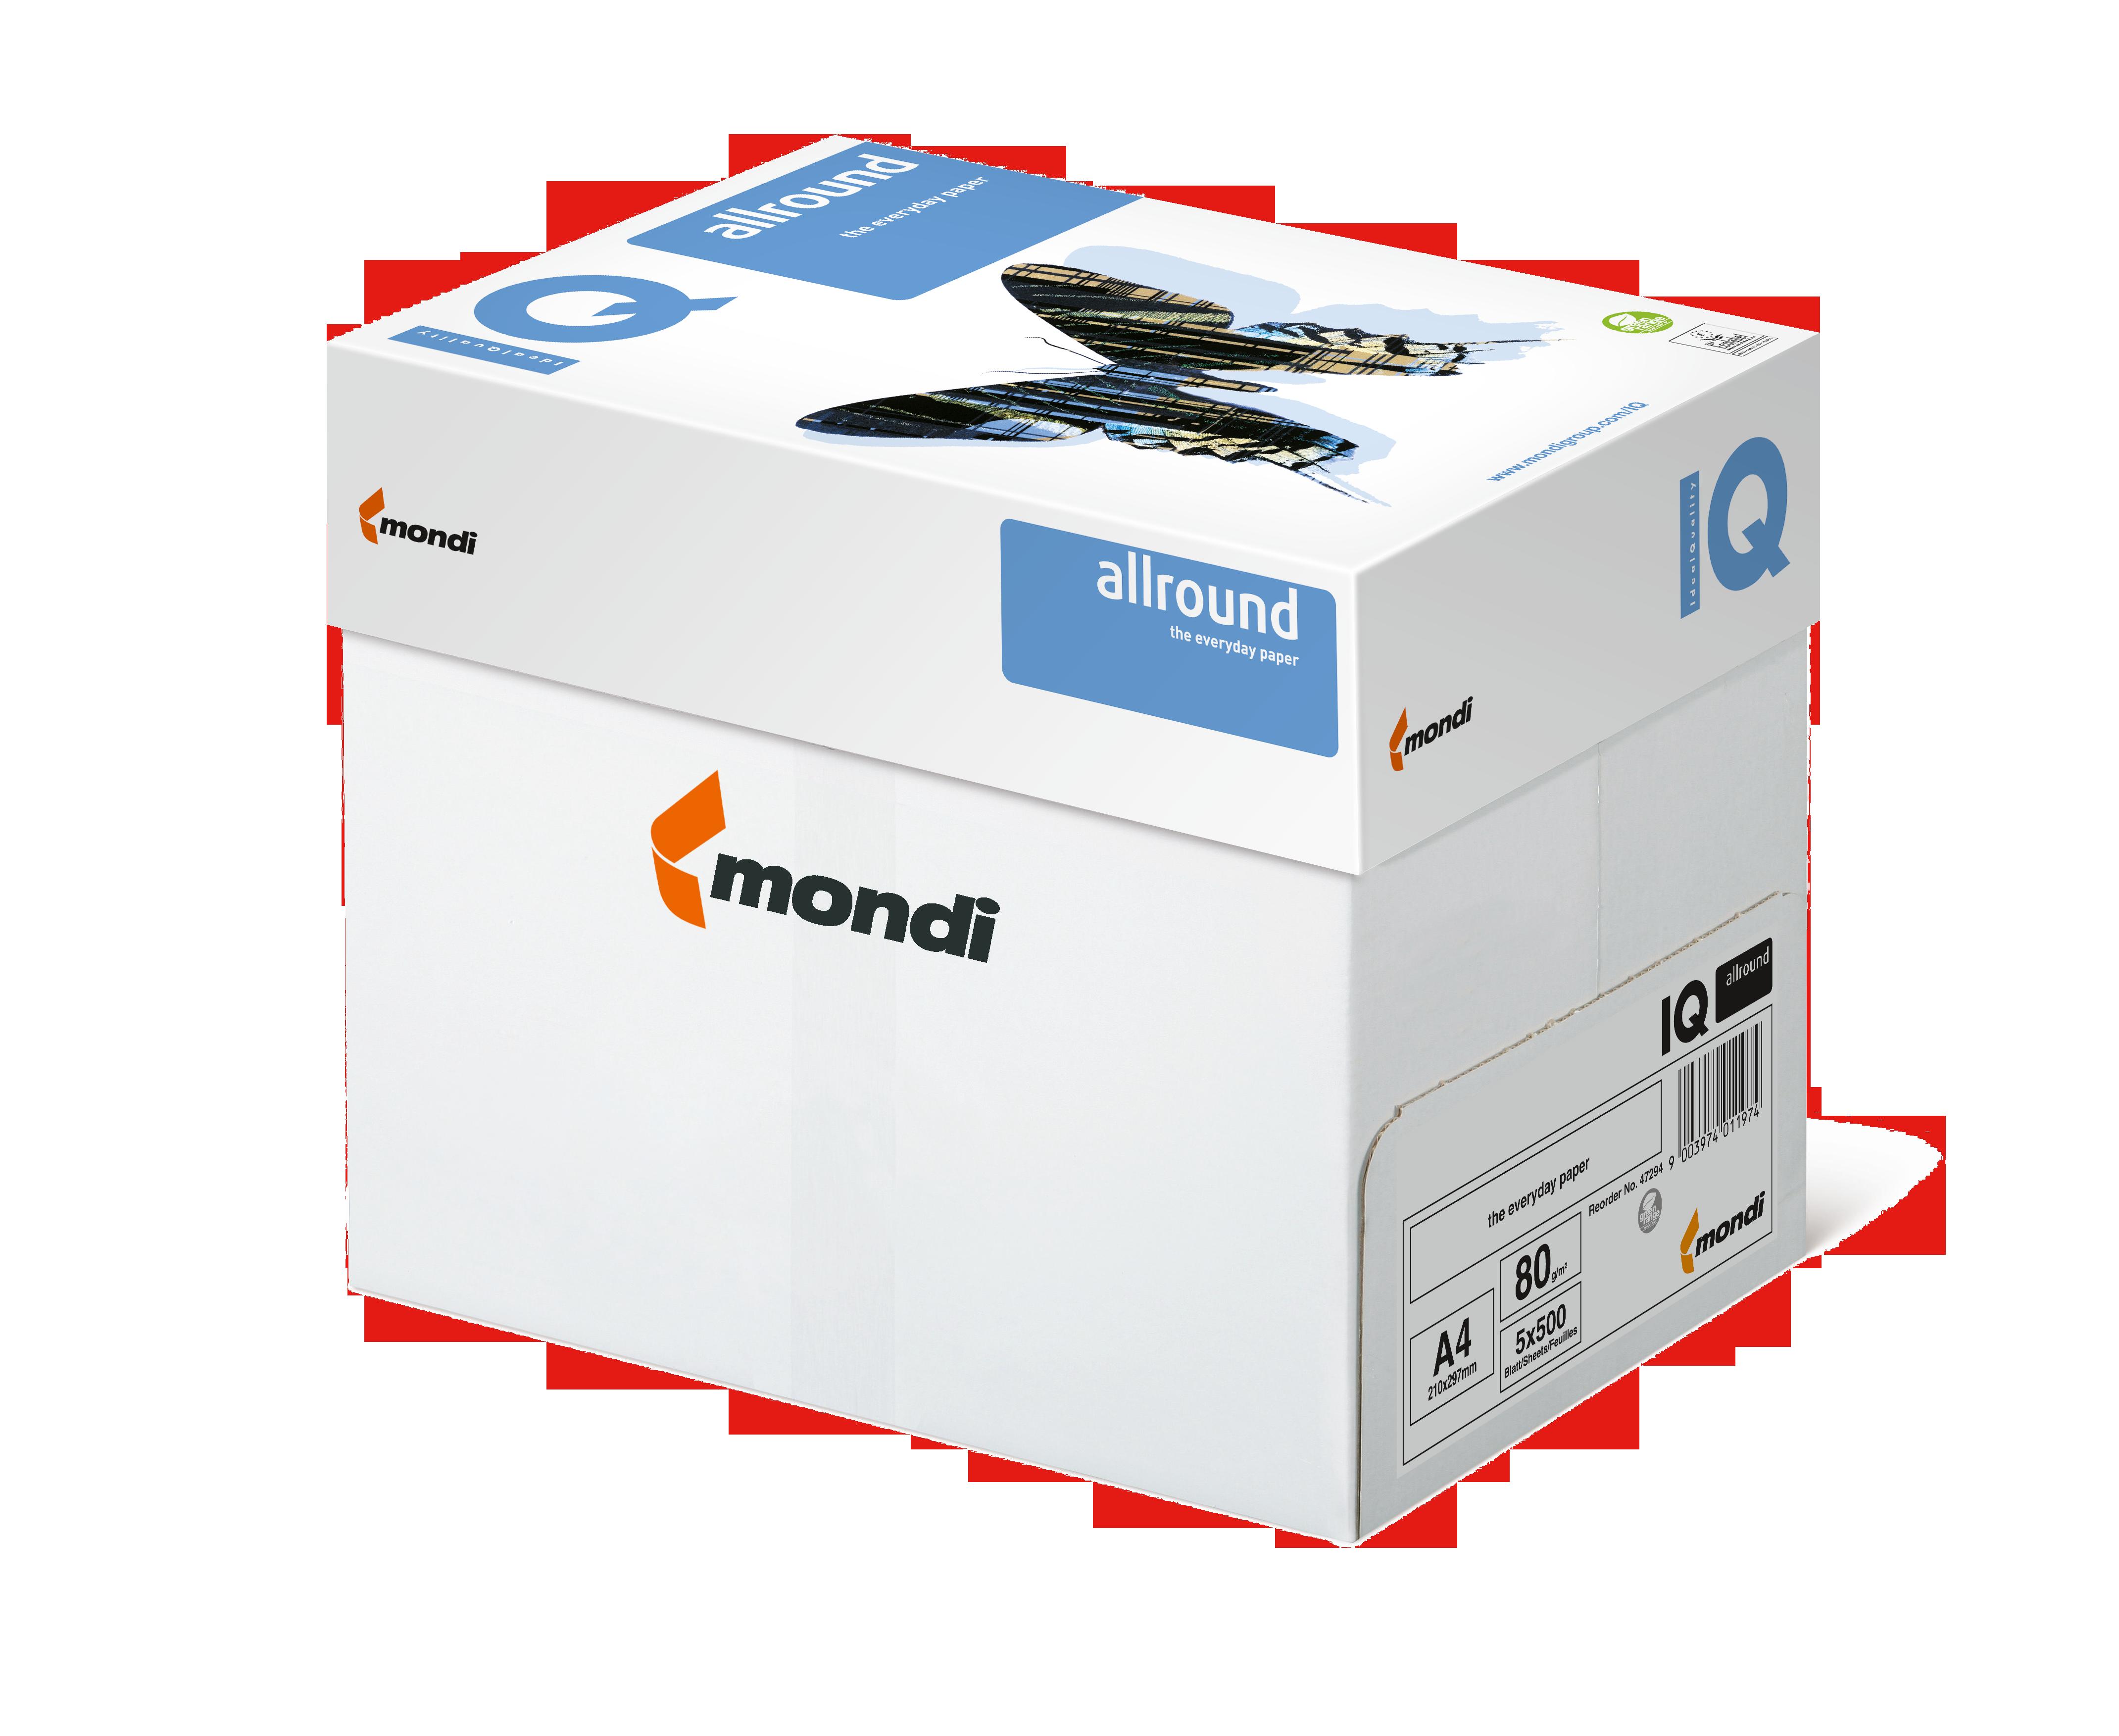 Print Ready Images Mondi Group Ideal 2245 4 Mm Paper Shredder Iq Allround